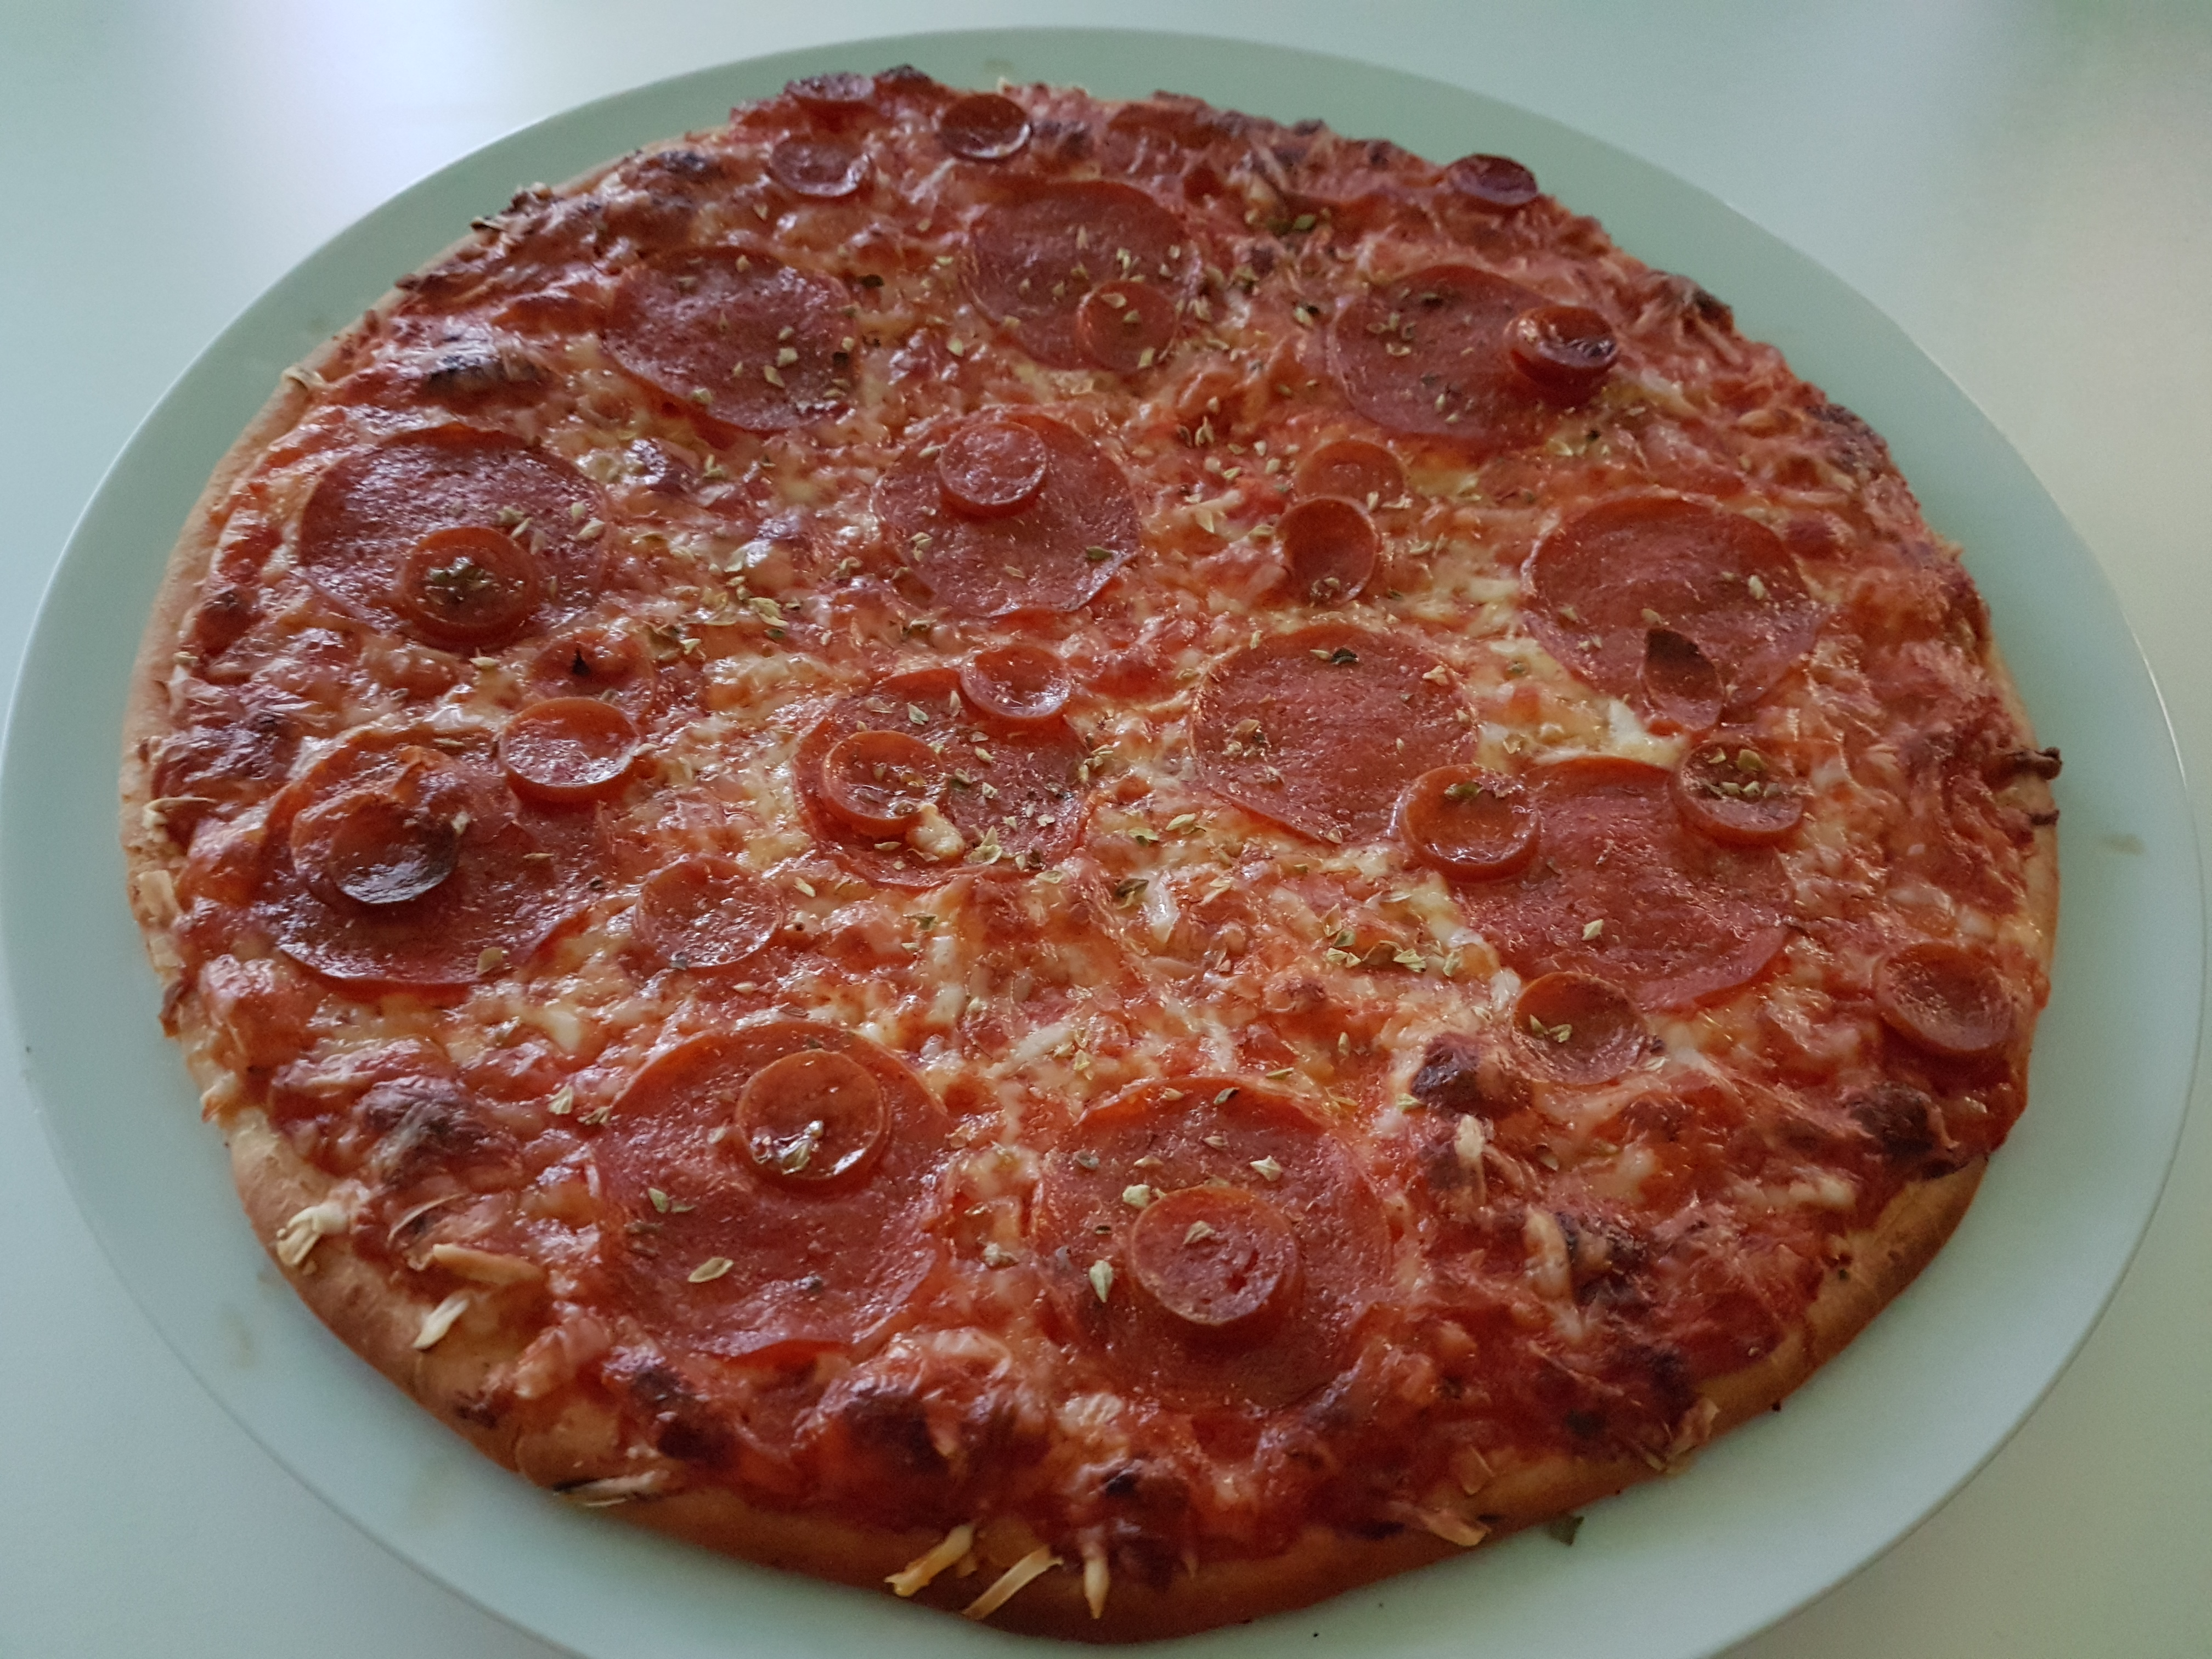 http://foodloader.net/Holz_2017-07-03_Pizza.jpg